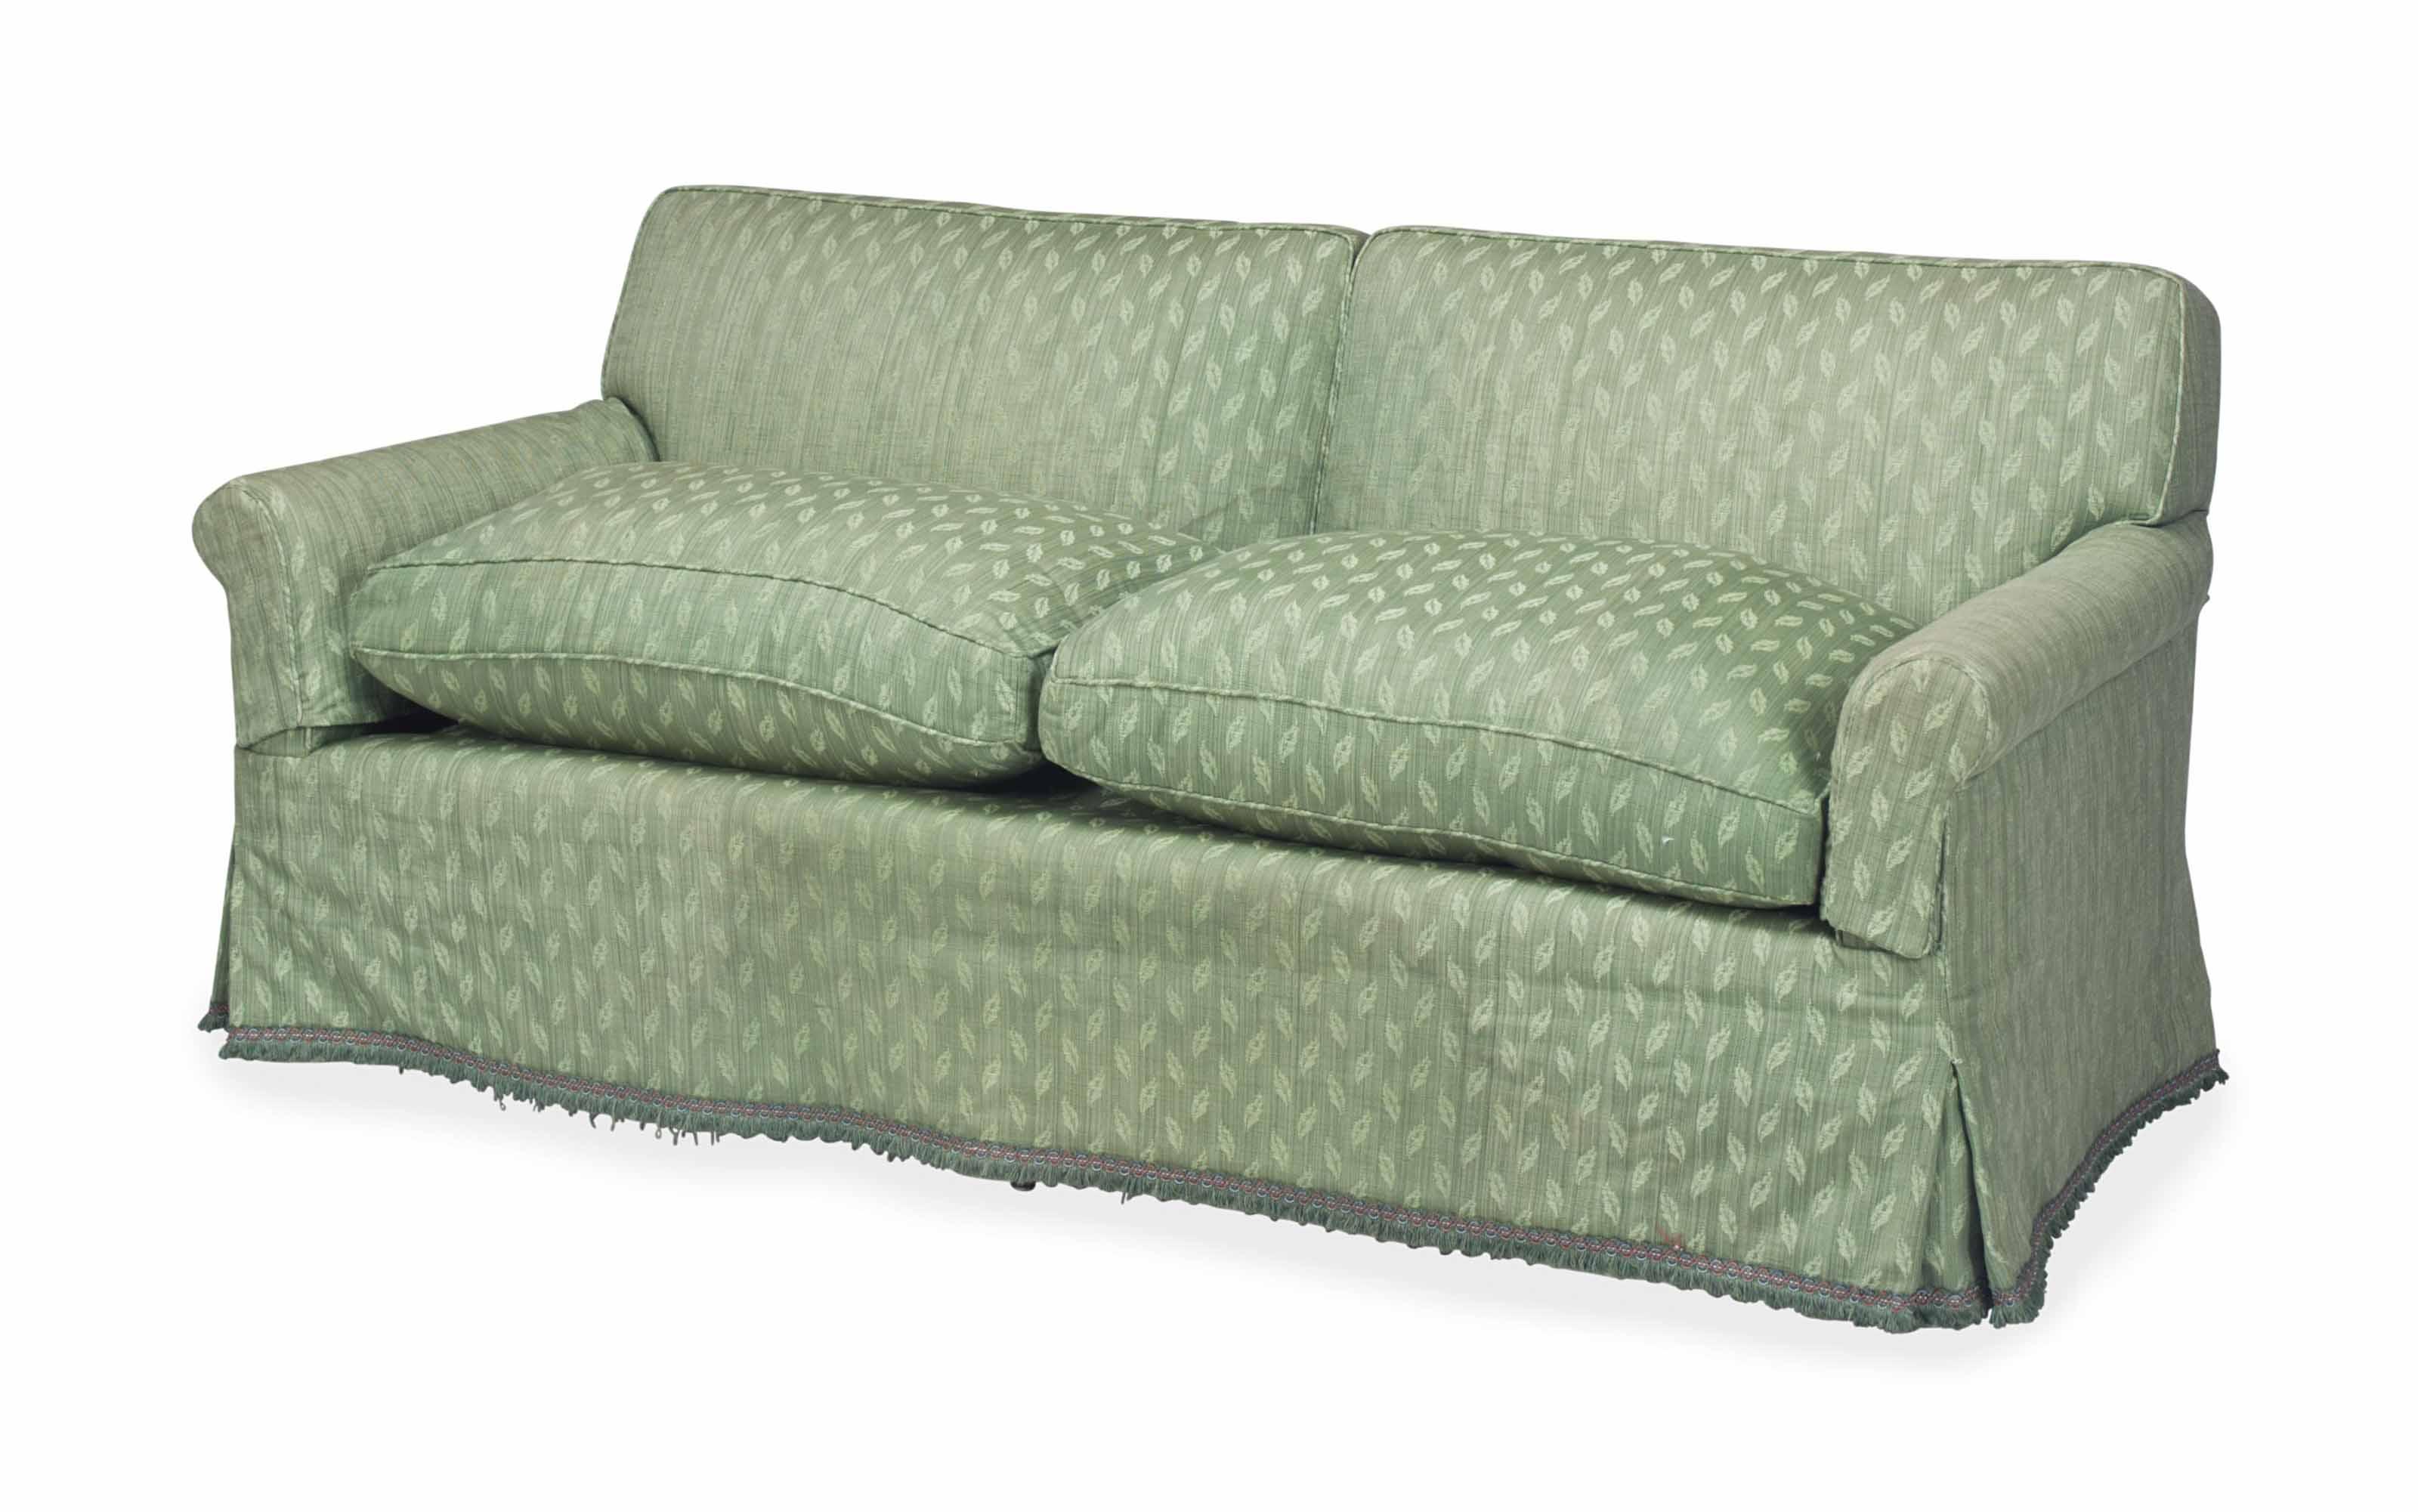 A MODERN TWO-SEAT SOFA UPHOLST